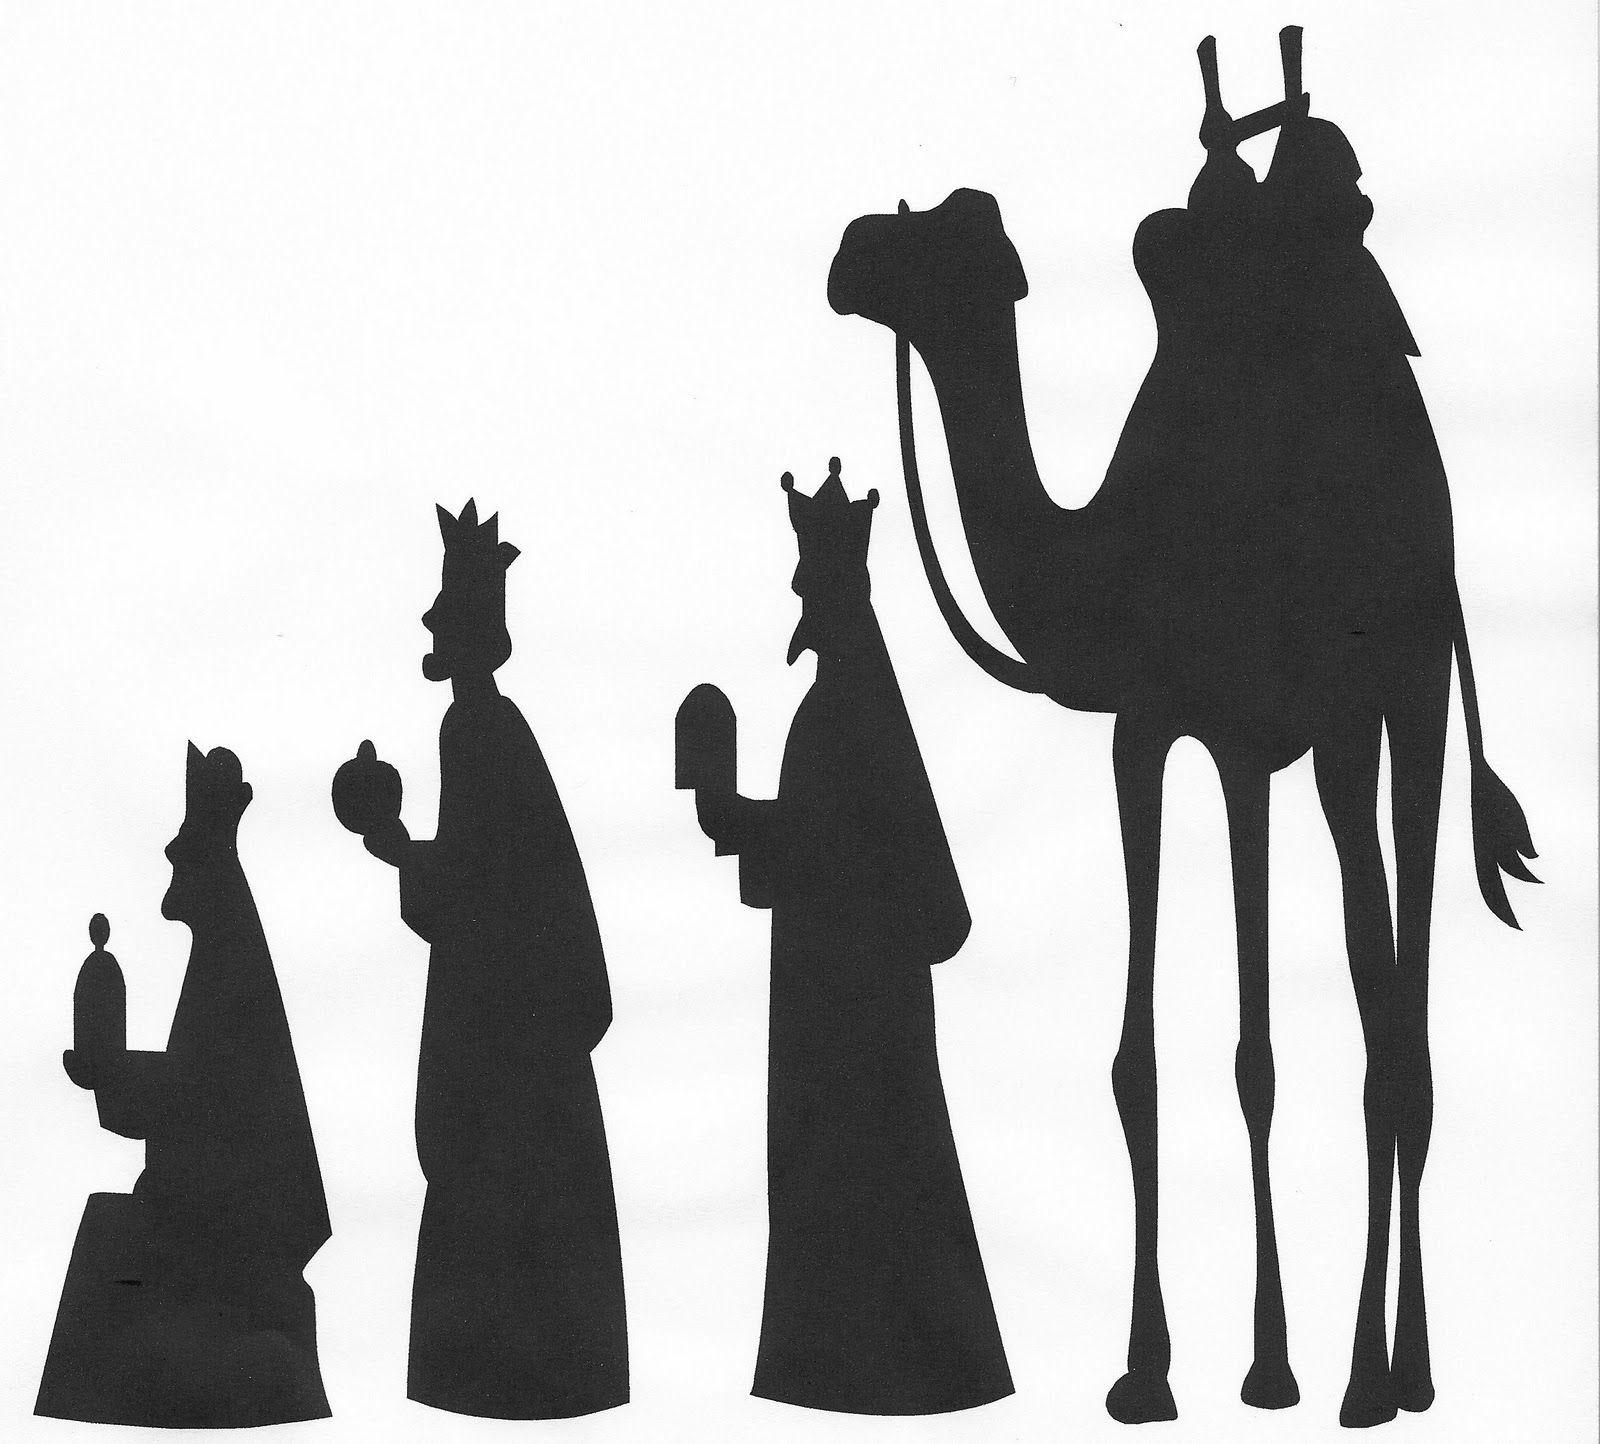 Manger clipart wisemen. Wise men silhouette clip